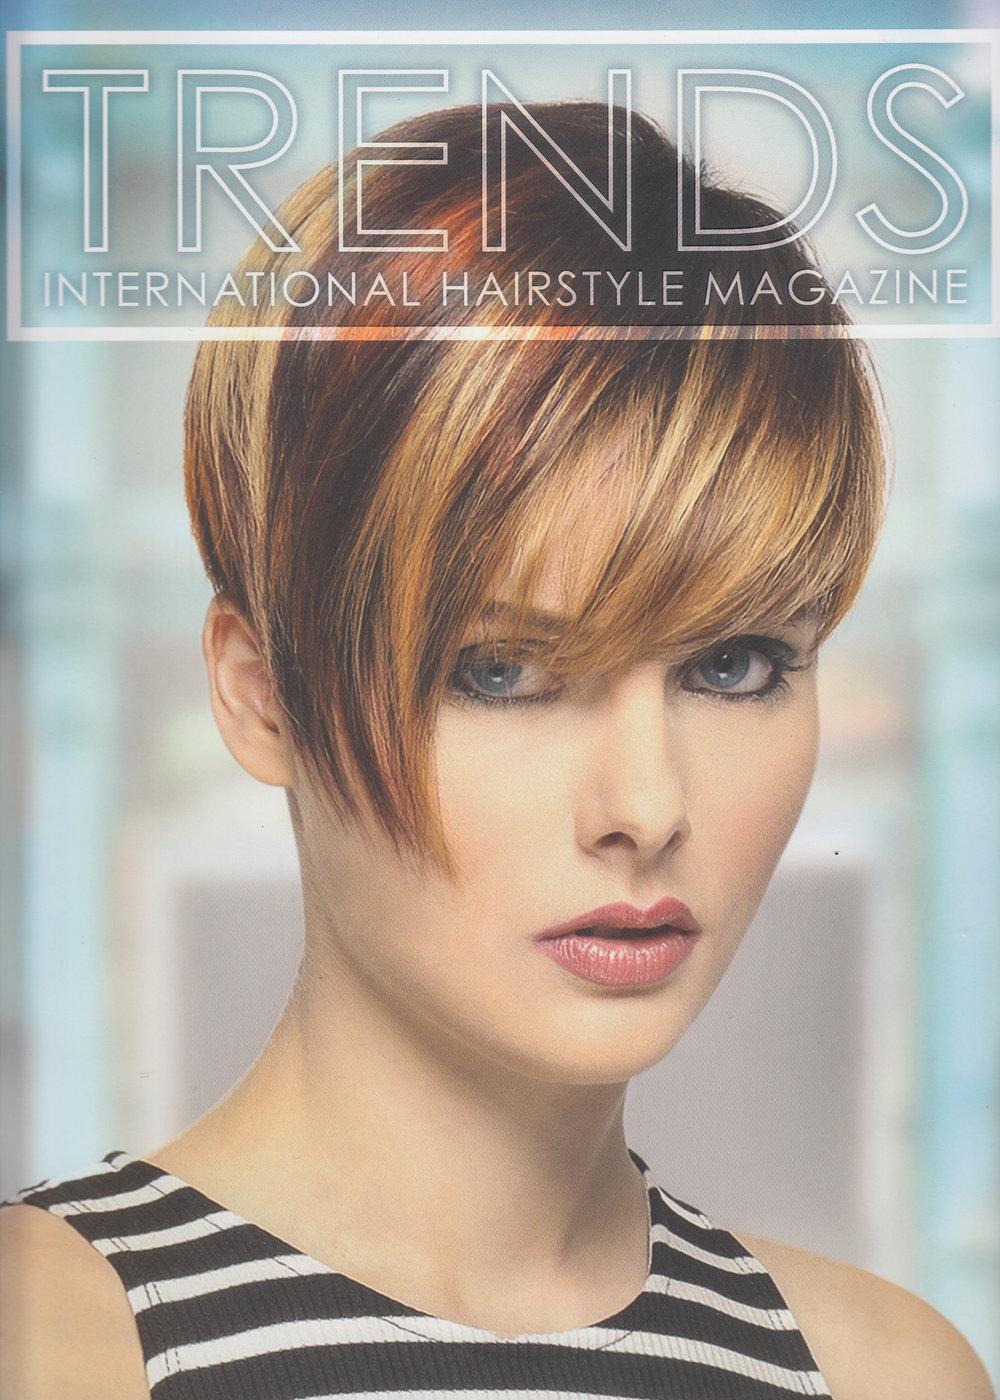 yoshikohair_stkilda_melbourne_hairdresser_hairsalon_trends17_cover